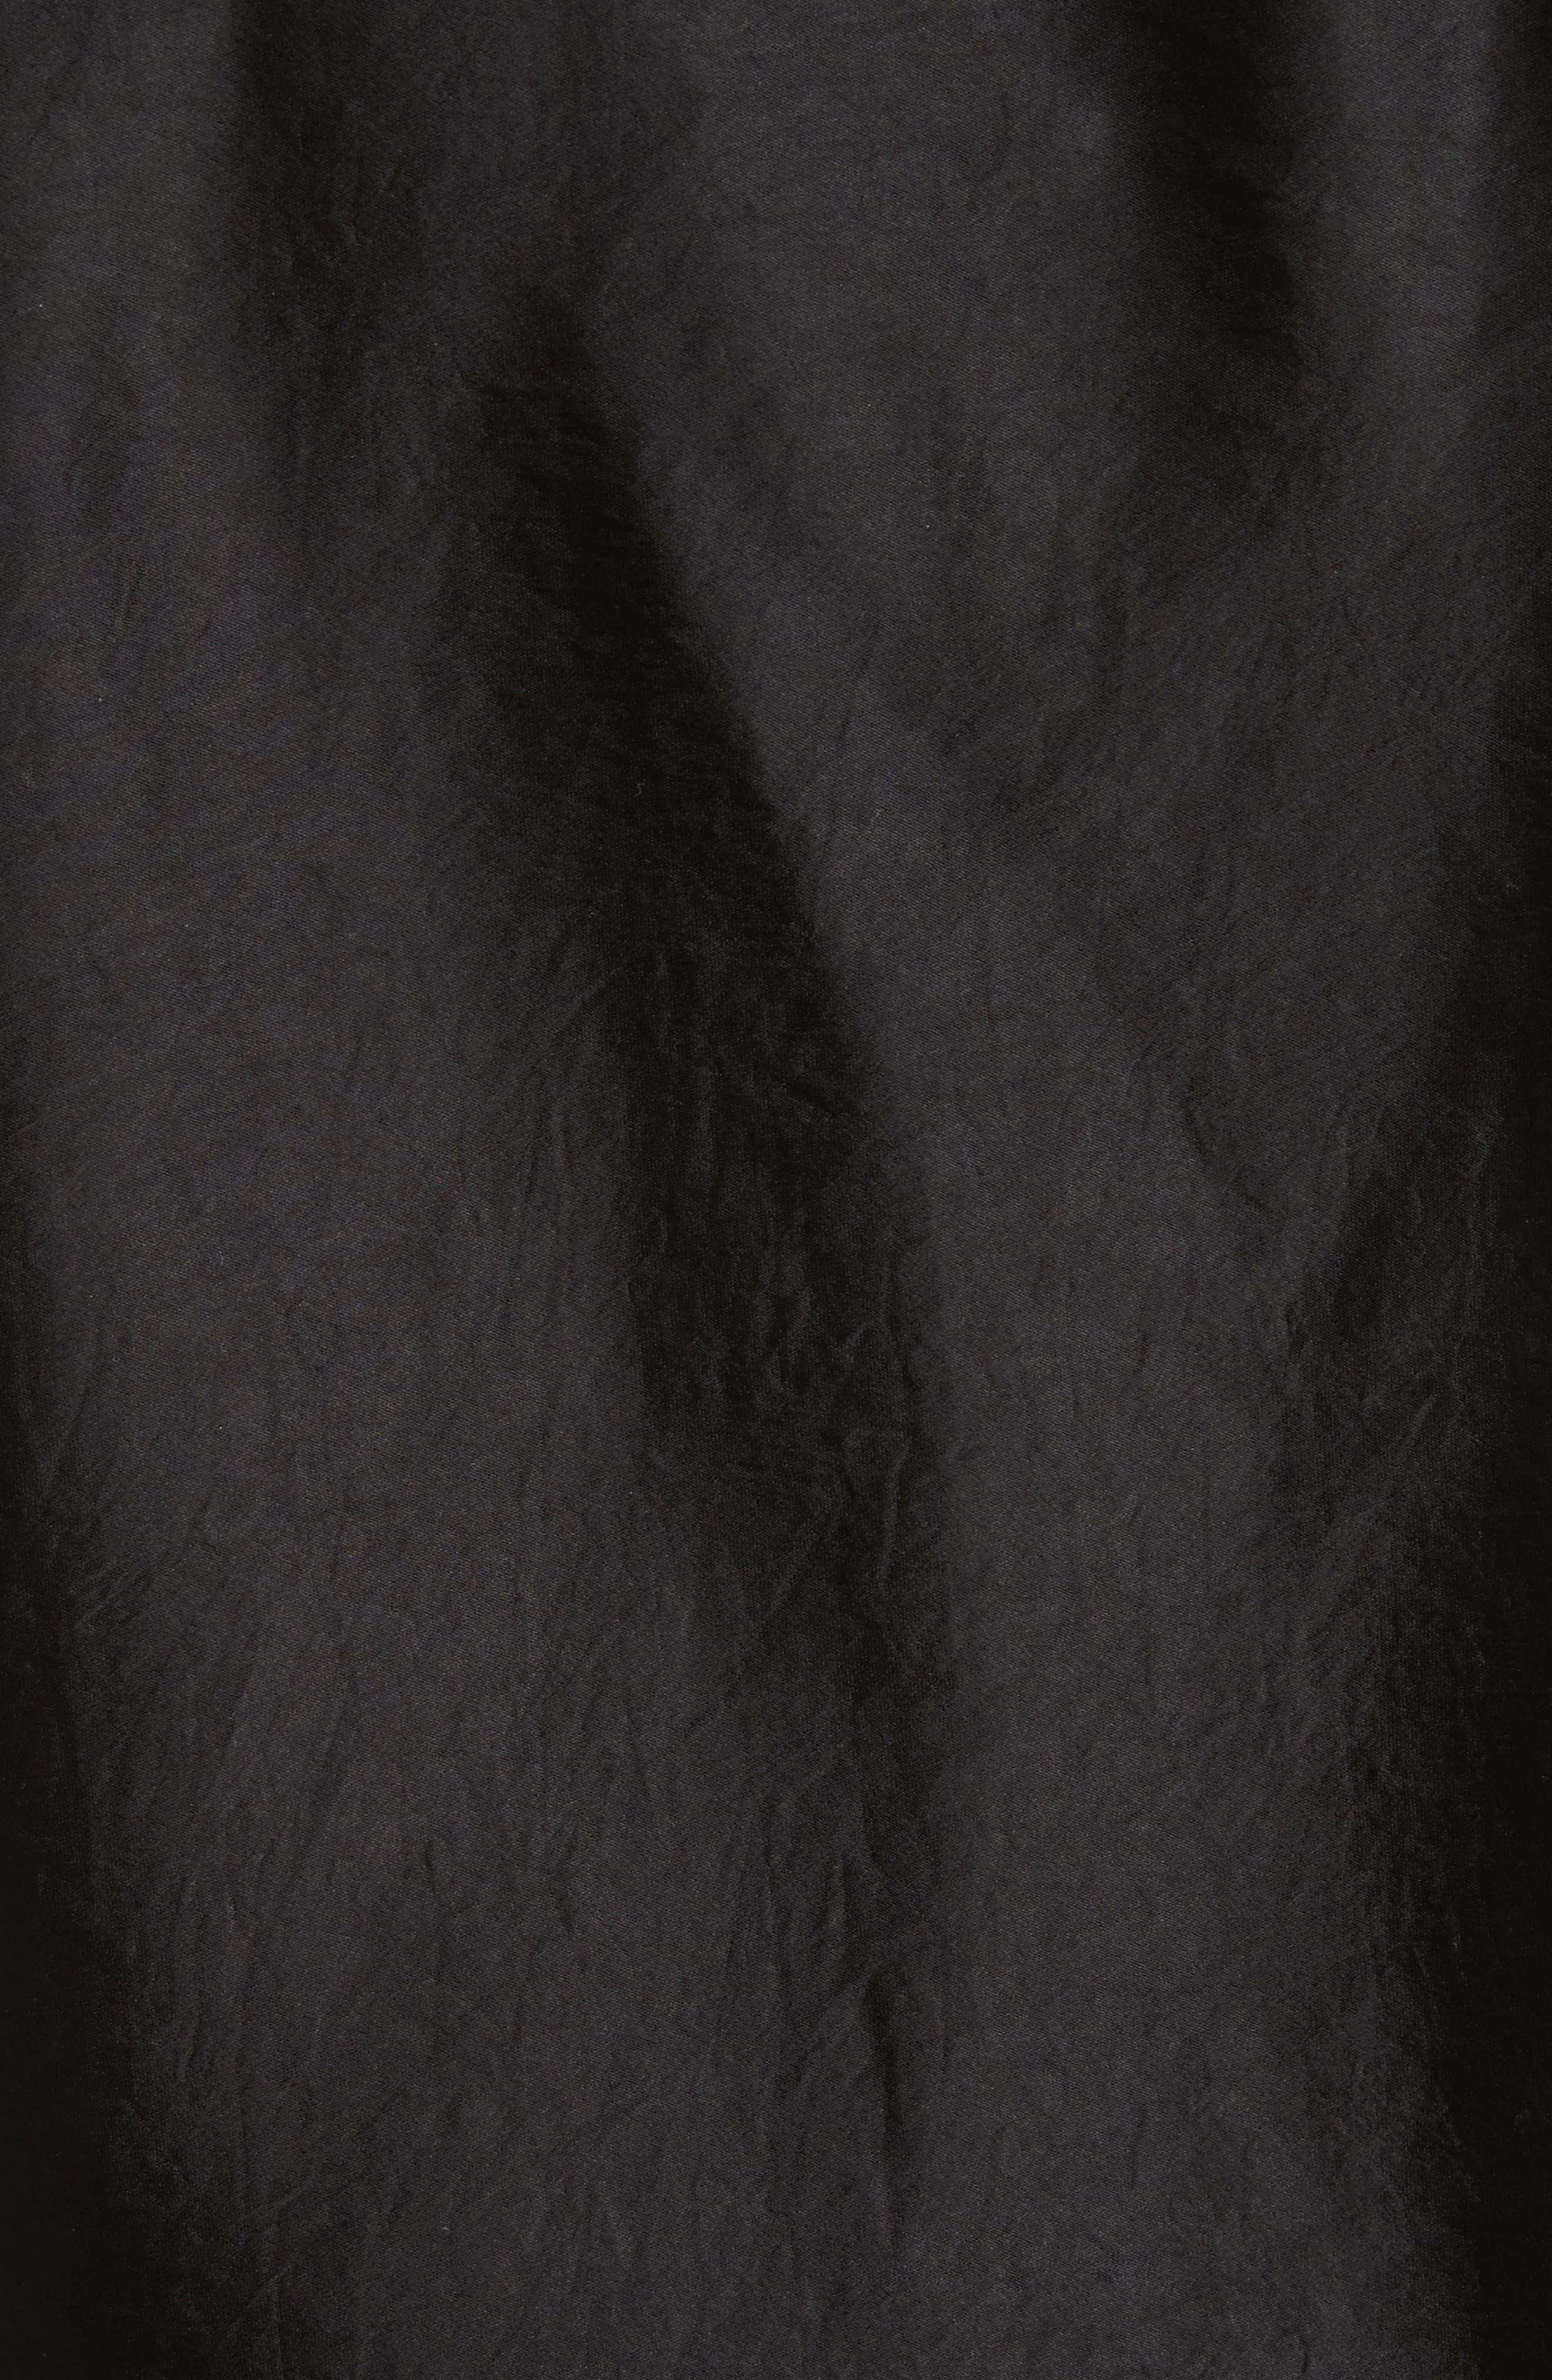 Satin One-Sleeve Blouse,                             Alternate thumbnail 5, color,